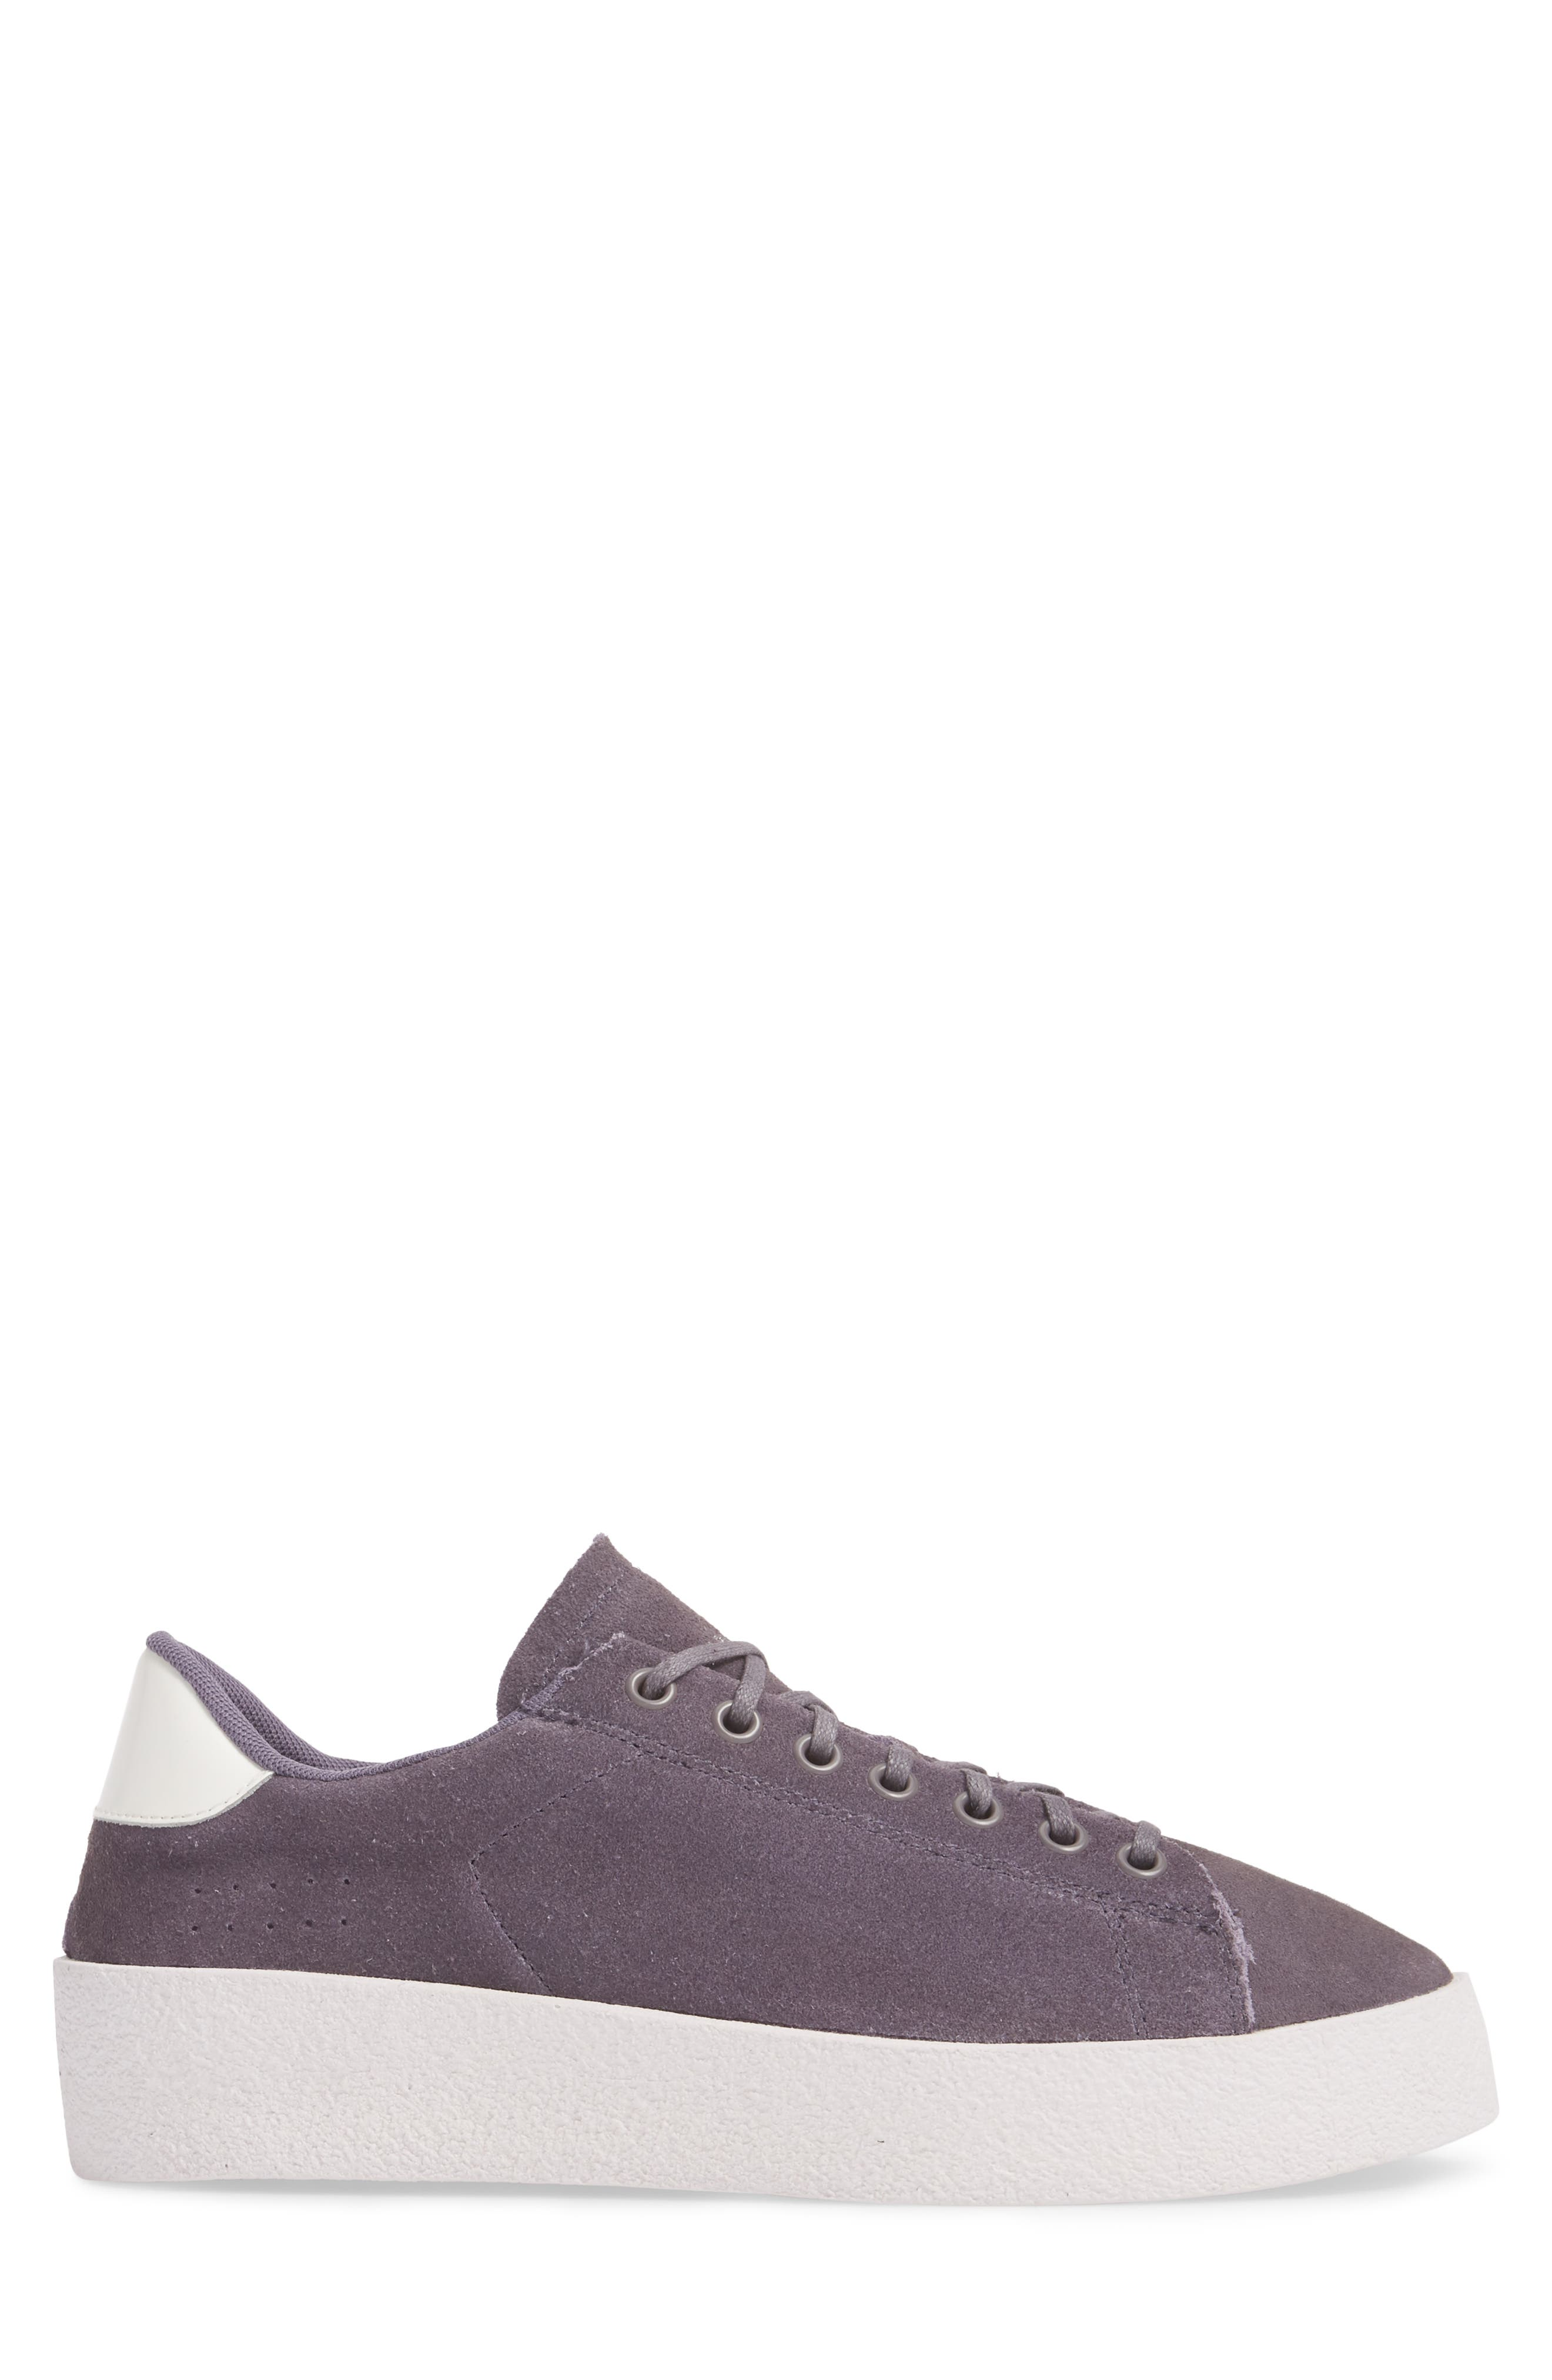 Jones Platform Sneaker,                             Alternate thumbnail 3, color,                             Purple Leather